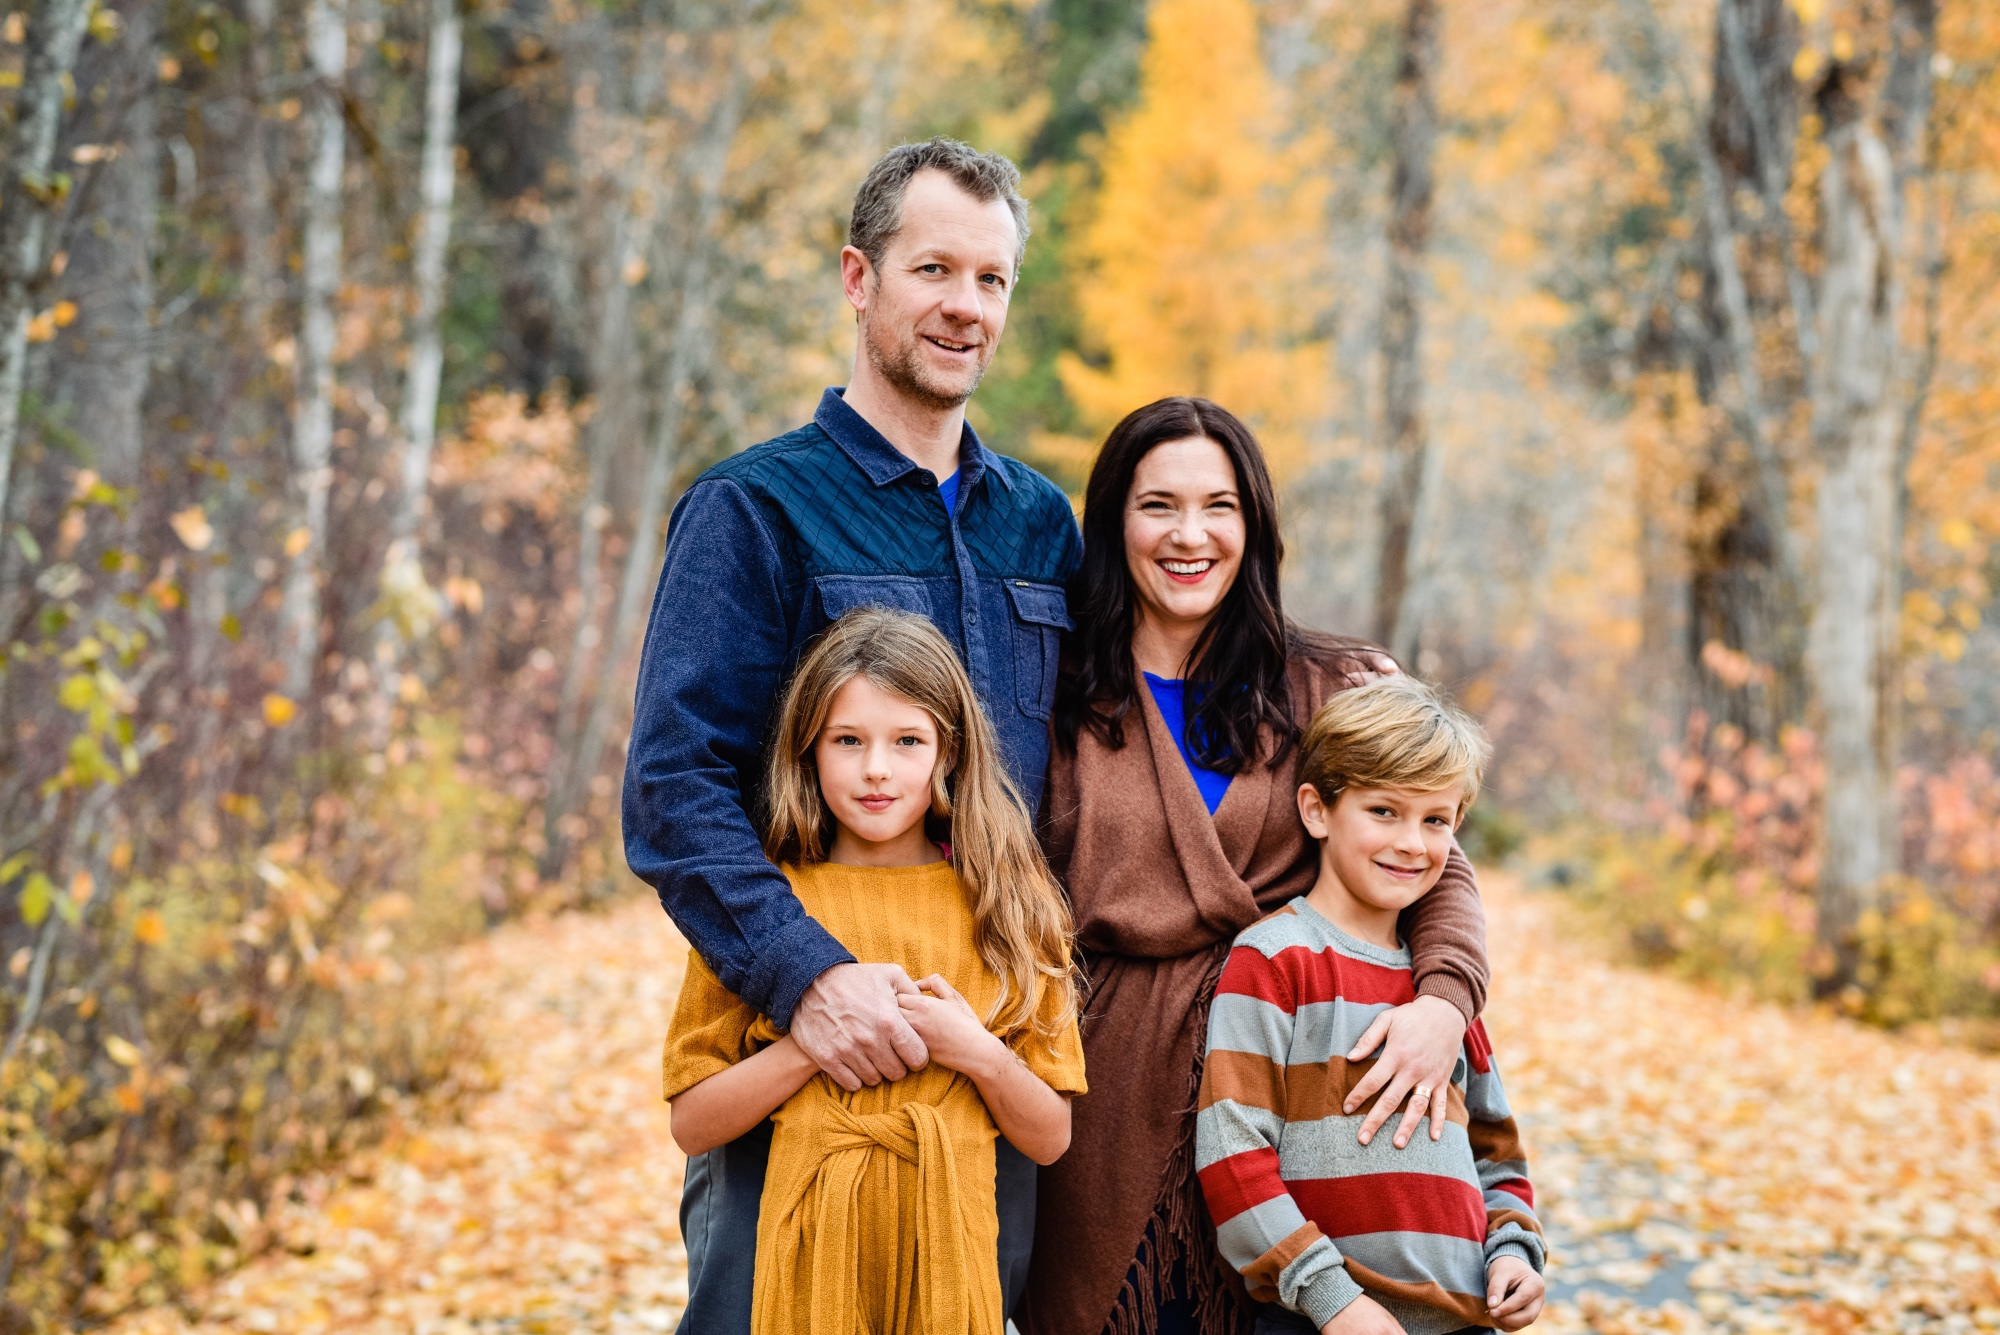 lindseyjane_family00.jpg